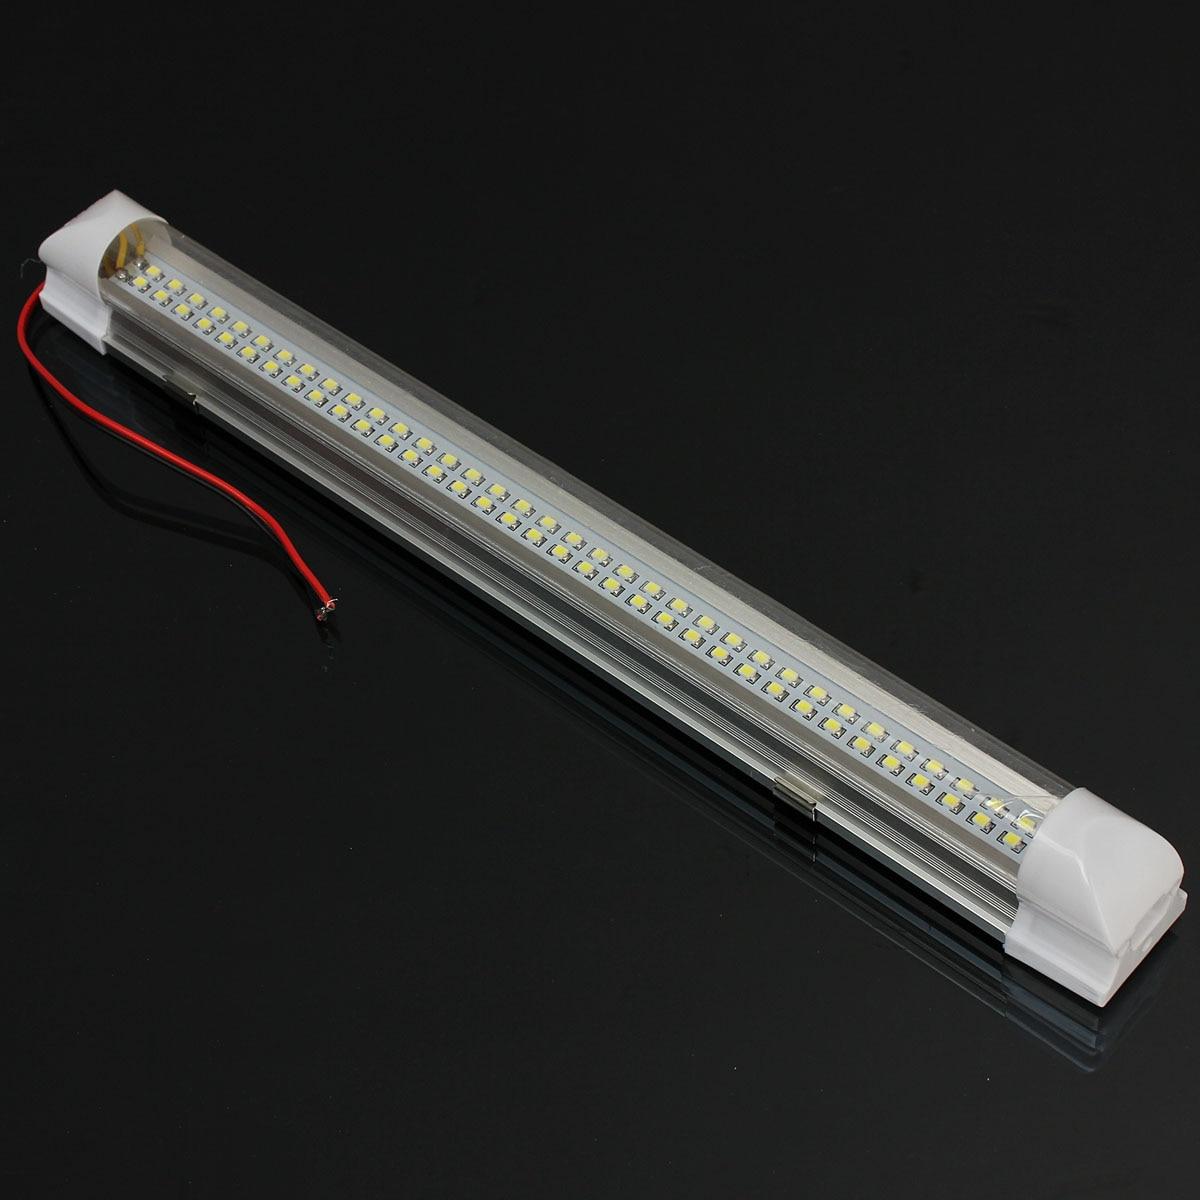 2x 12V Universal Durable Car Auto Caravan Interior 72 LED White Light Strip Bar 340MM Lamp ON/OFF Switch